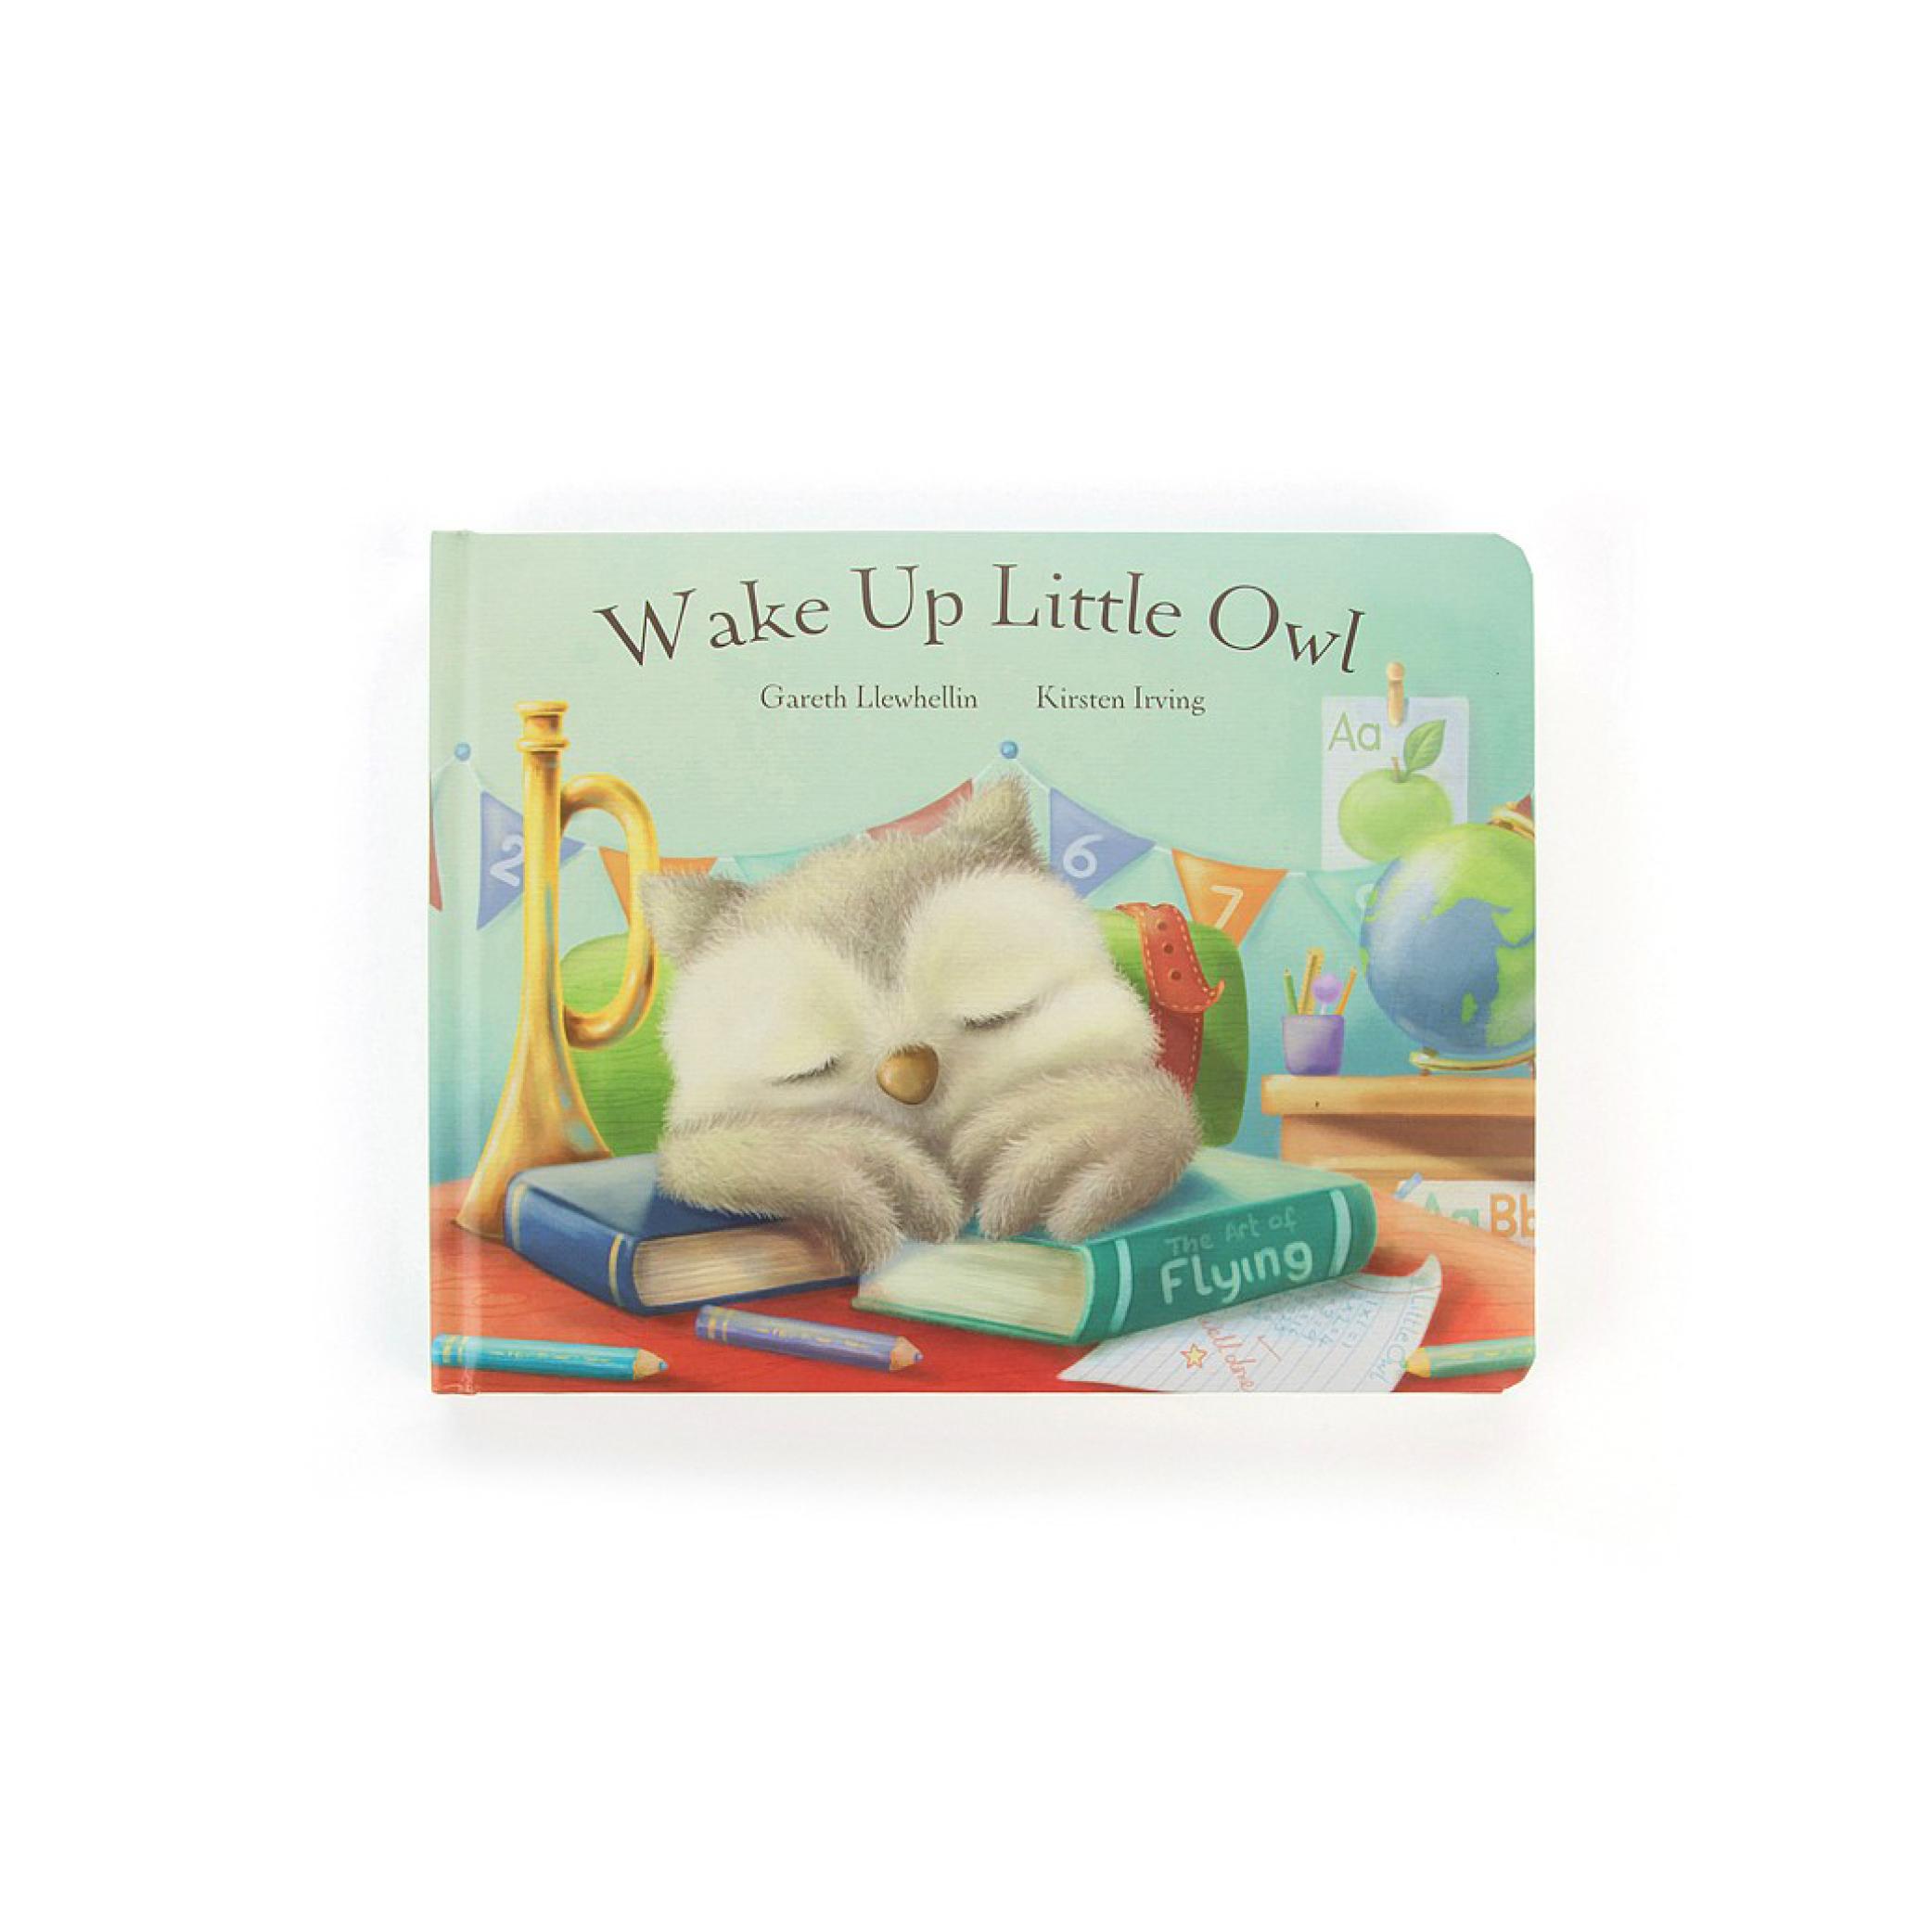 Wake Up Little Owl Book $15.00   Wants 1 Has 0 Needs 1